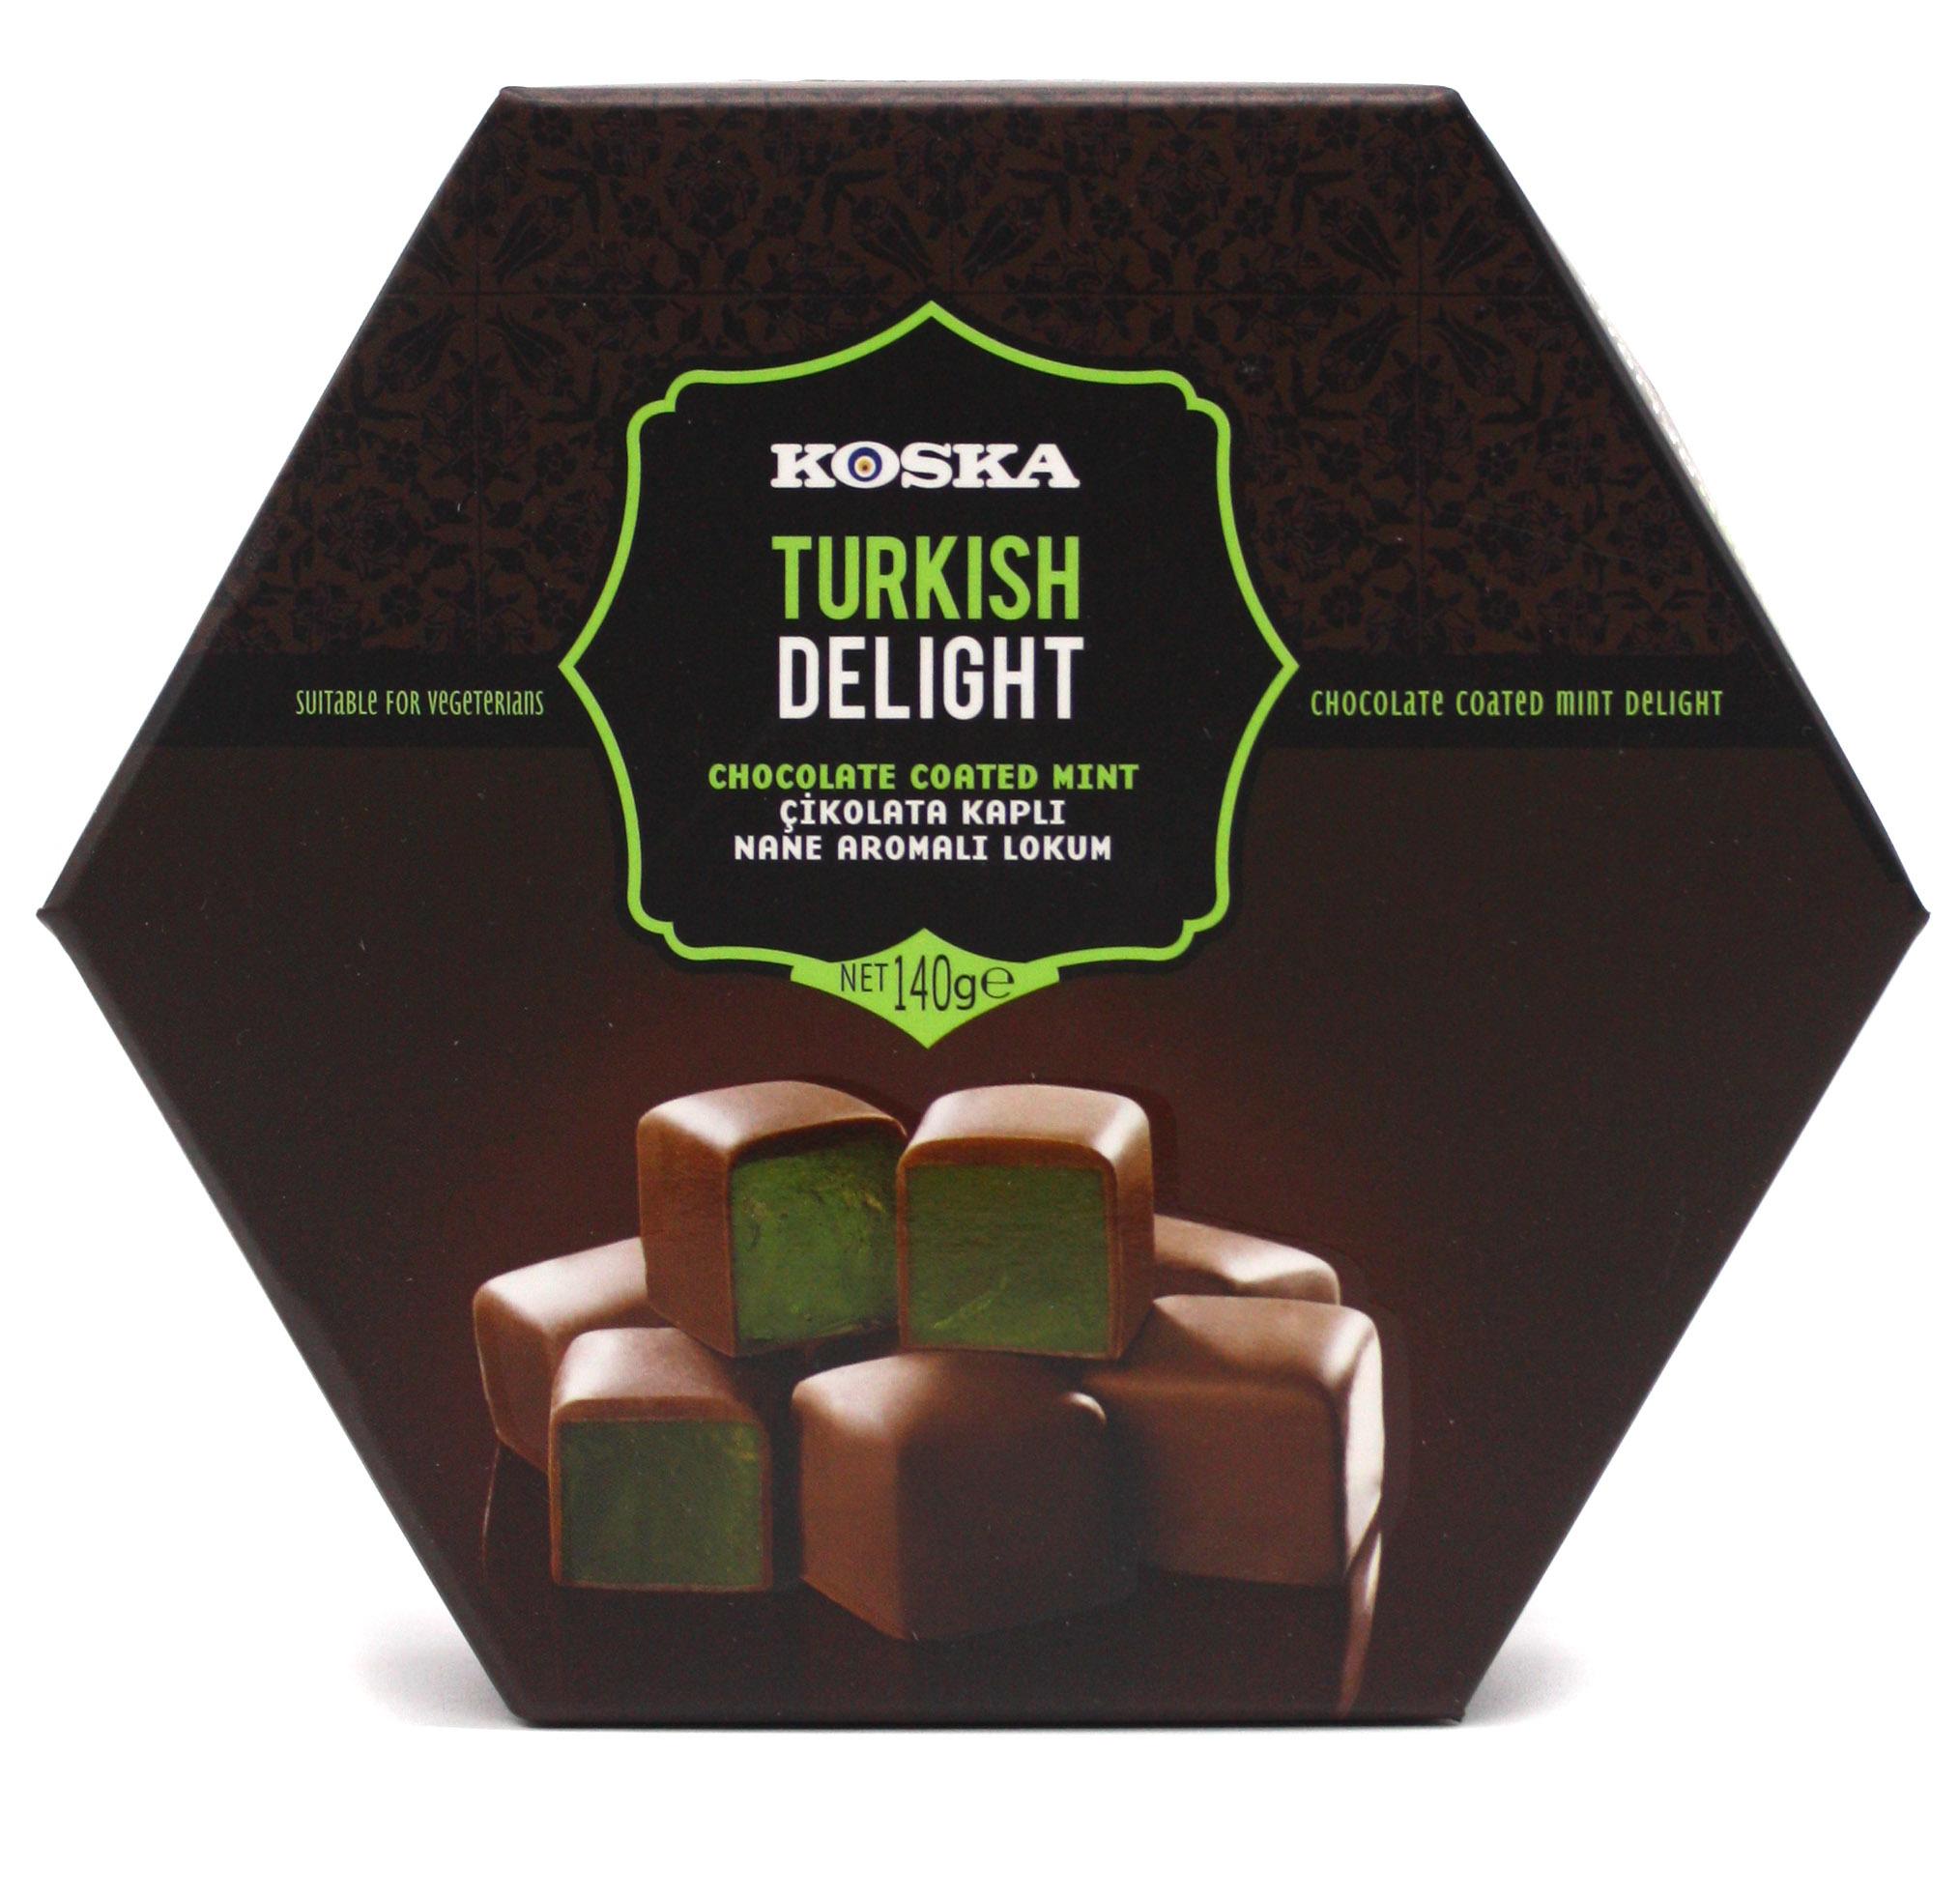 Koska Рахат-лукум со вкусом мяты в молочном шоколаде, Koska, 140 г import_files_18_18e83e3702ca11eaa9bb484d7ecee297_7b105e120acd11eaa9c3484d7ecee297.jpg